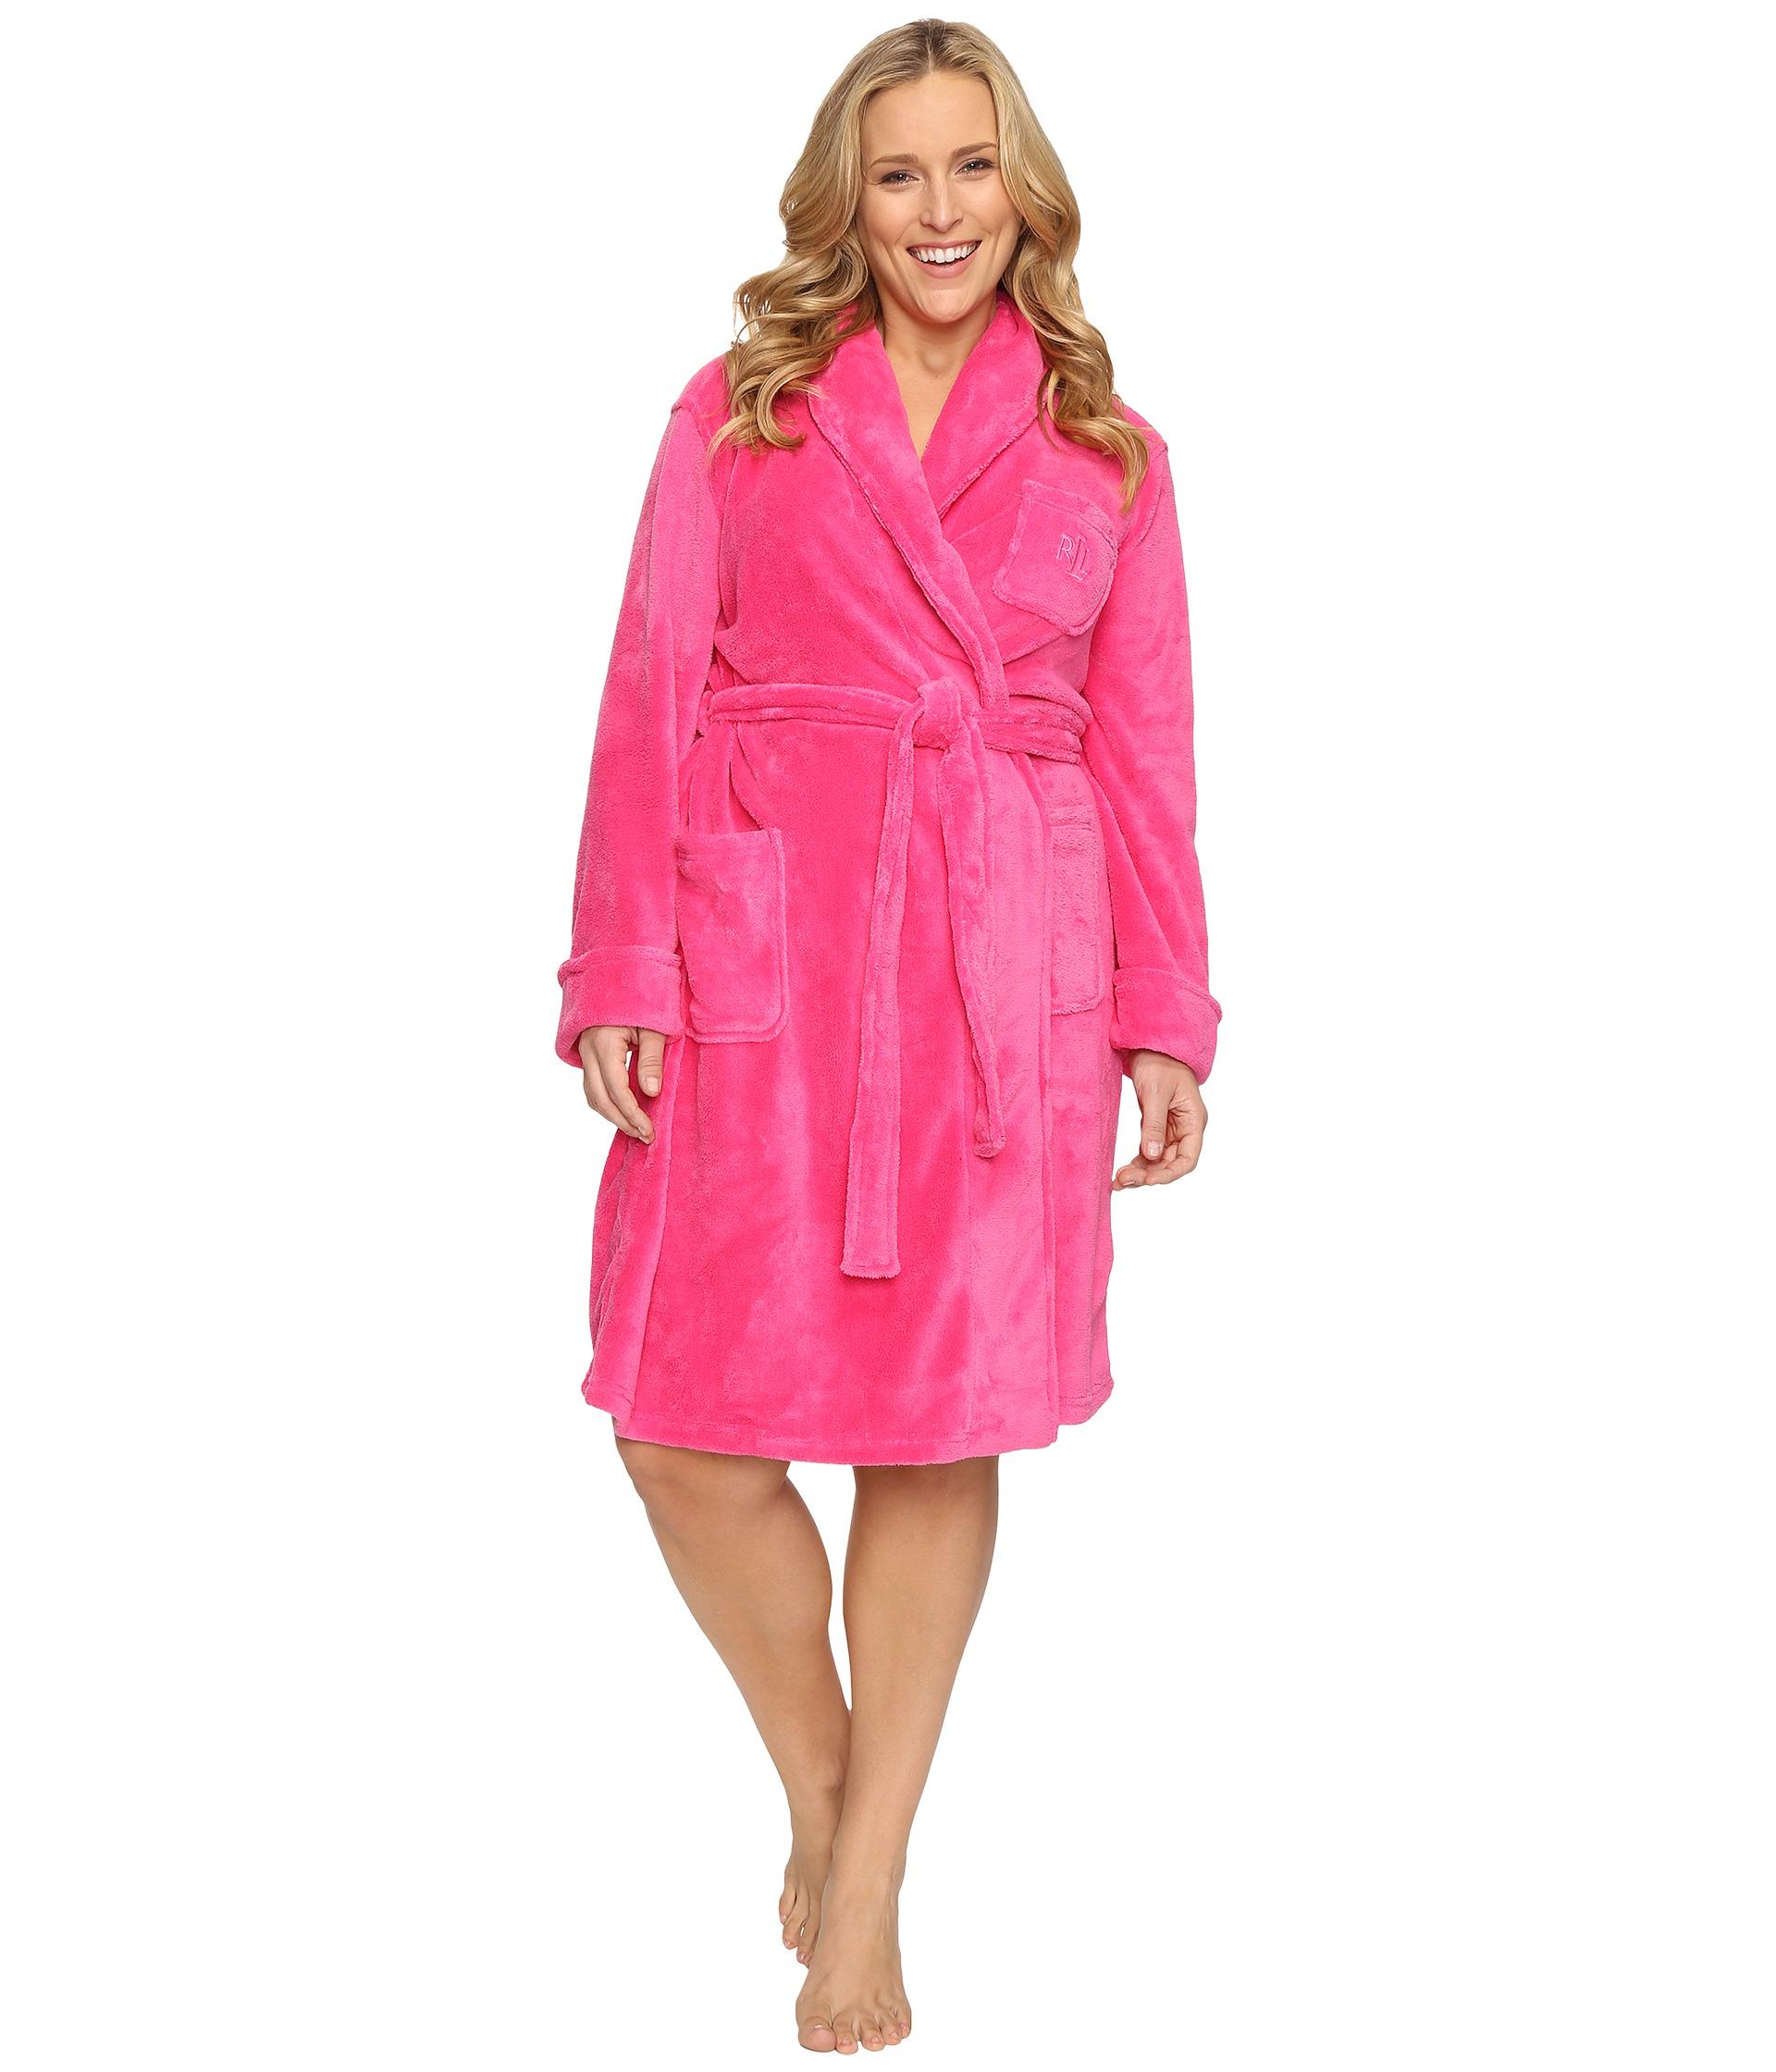 lauren ralph lauren plus size so soft short robe free shipping both ways. Black Bedroom Furniture Sets. Home Design Ideas